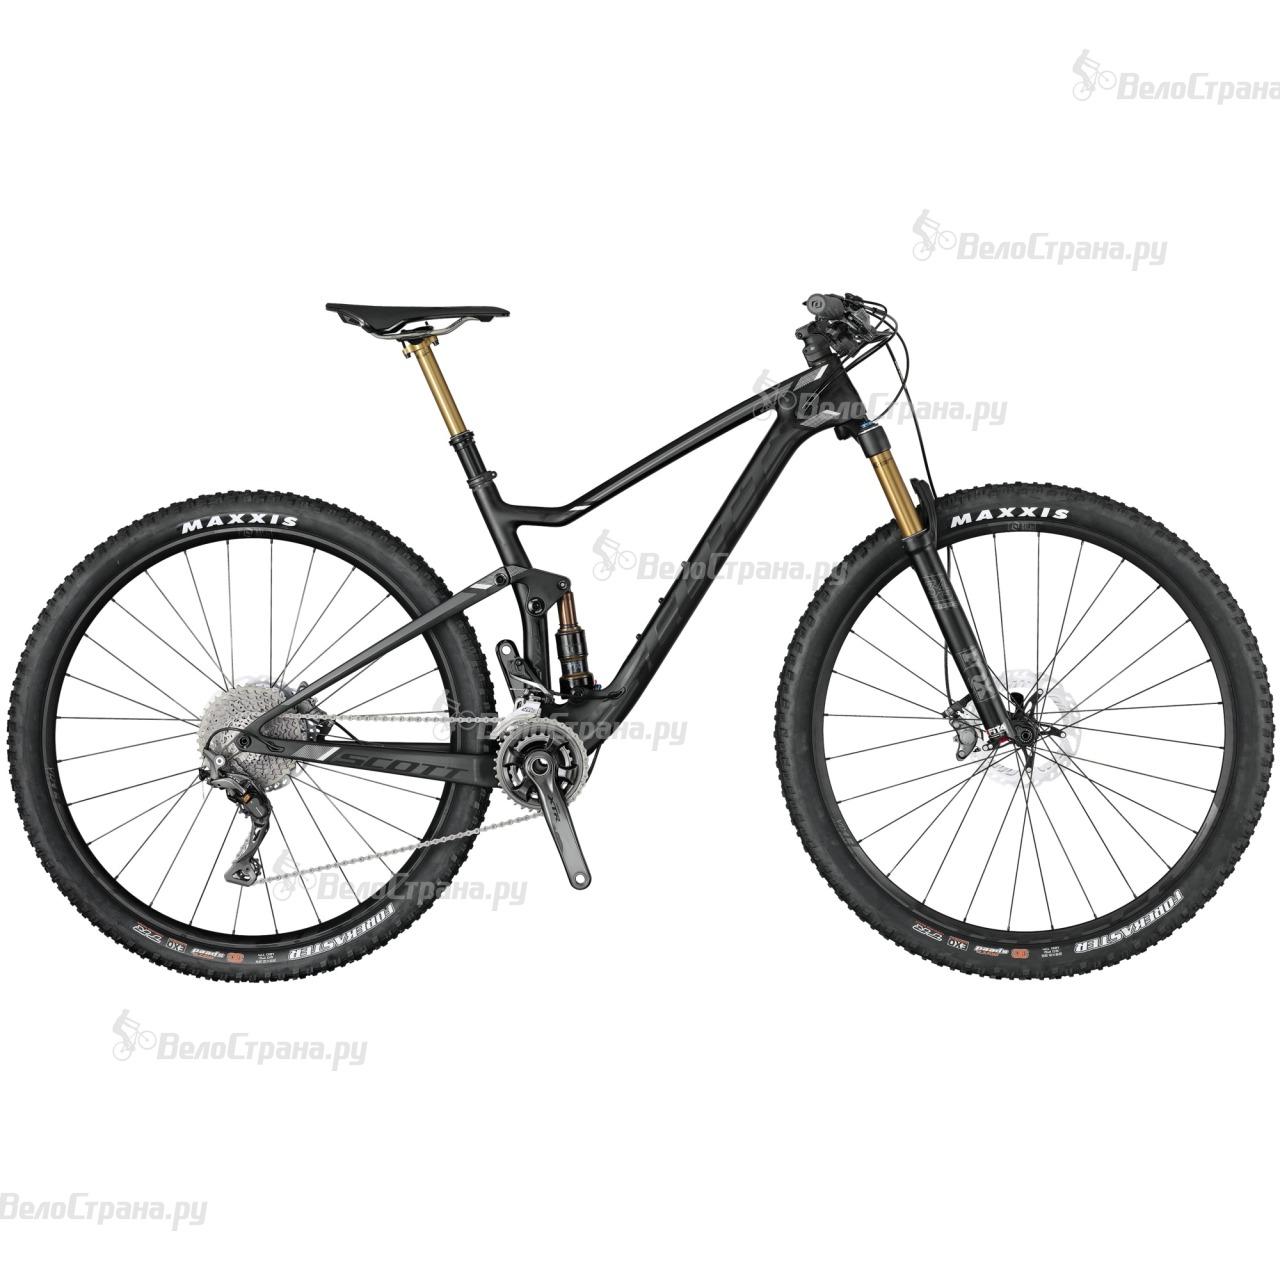 Велосипед Scott Spark 900 Premium (2017) scott spark 750 2017